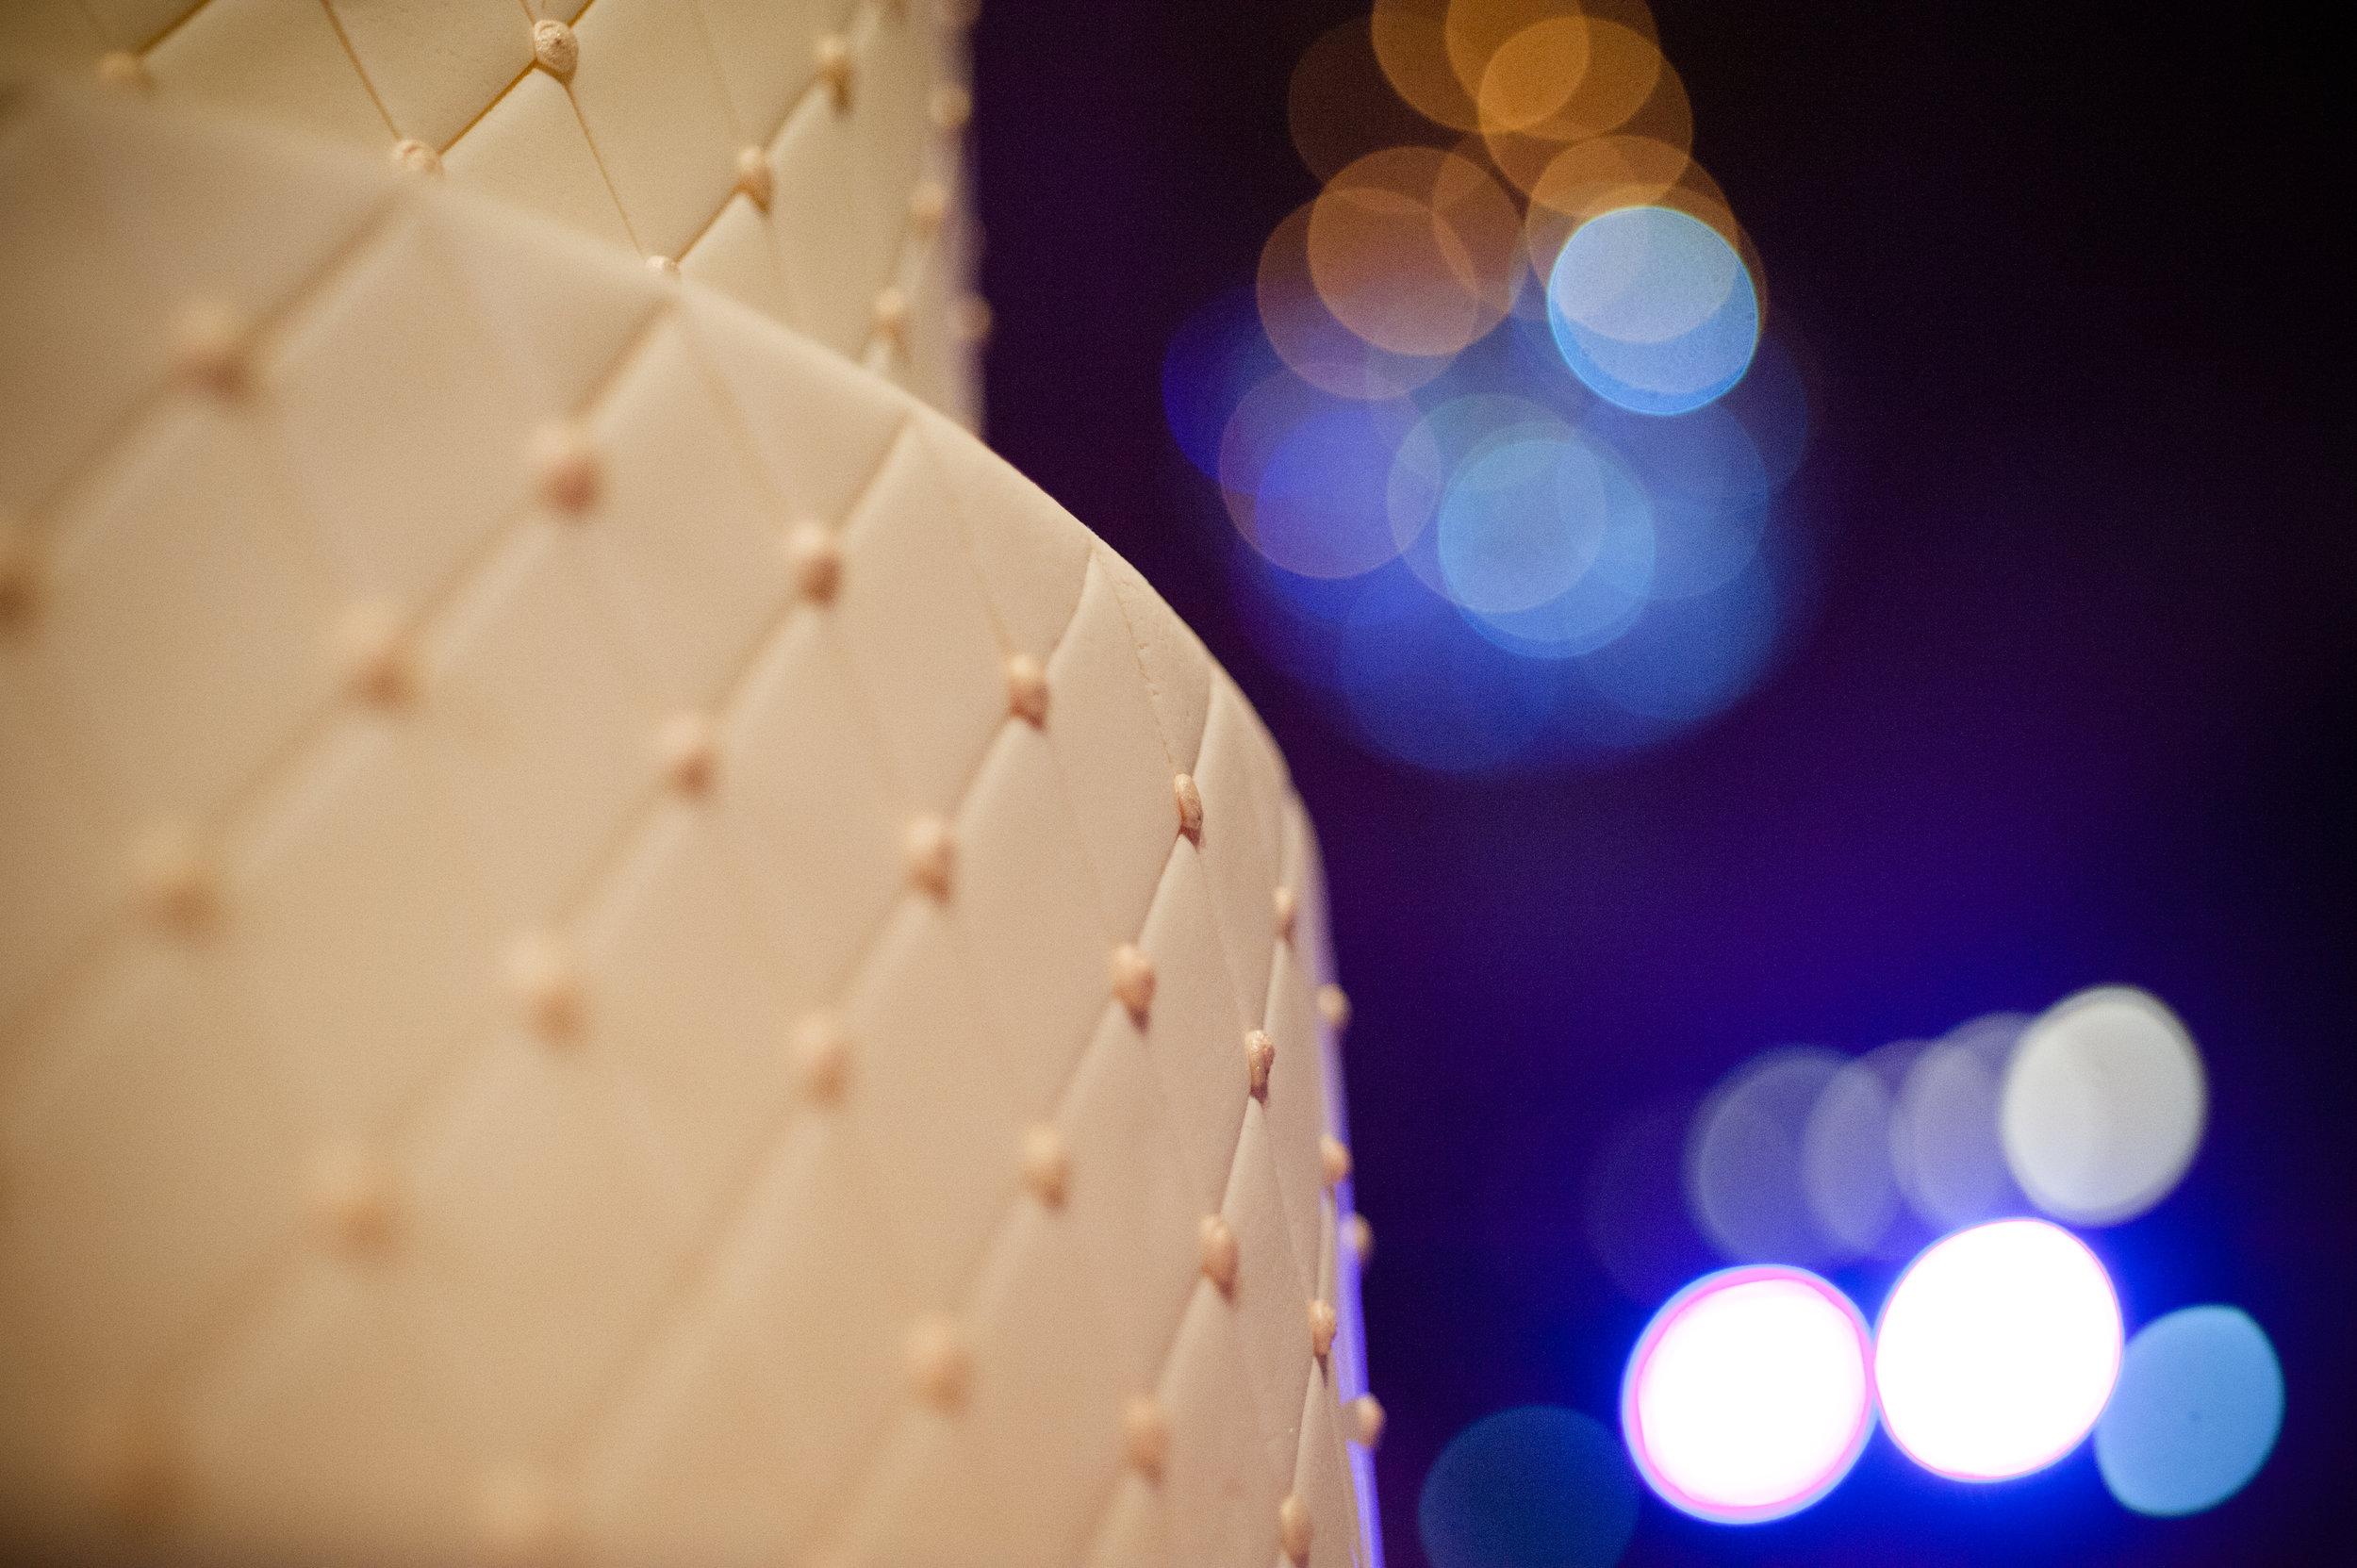 37  wedding cake closeup detailed wedding cake simple wedding cake all white wedding cake flowers on wedding cake Christine Johnson Photography Life Design Events.jpg